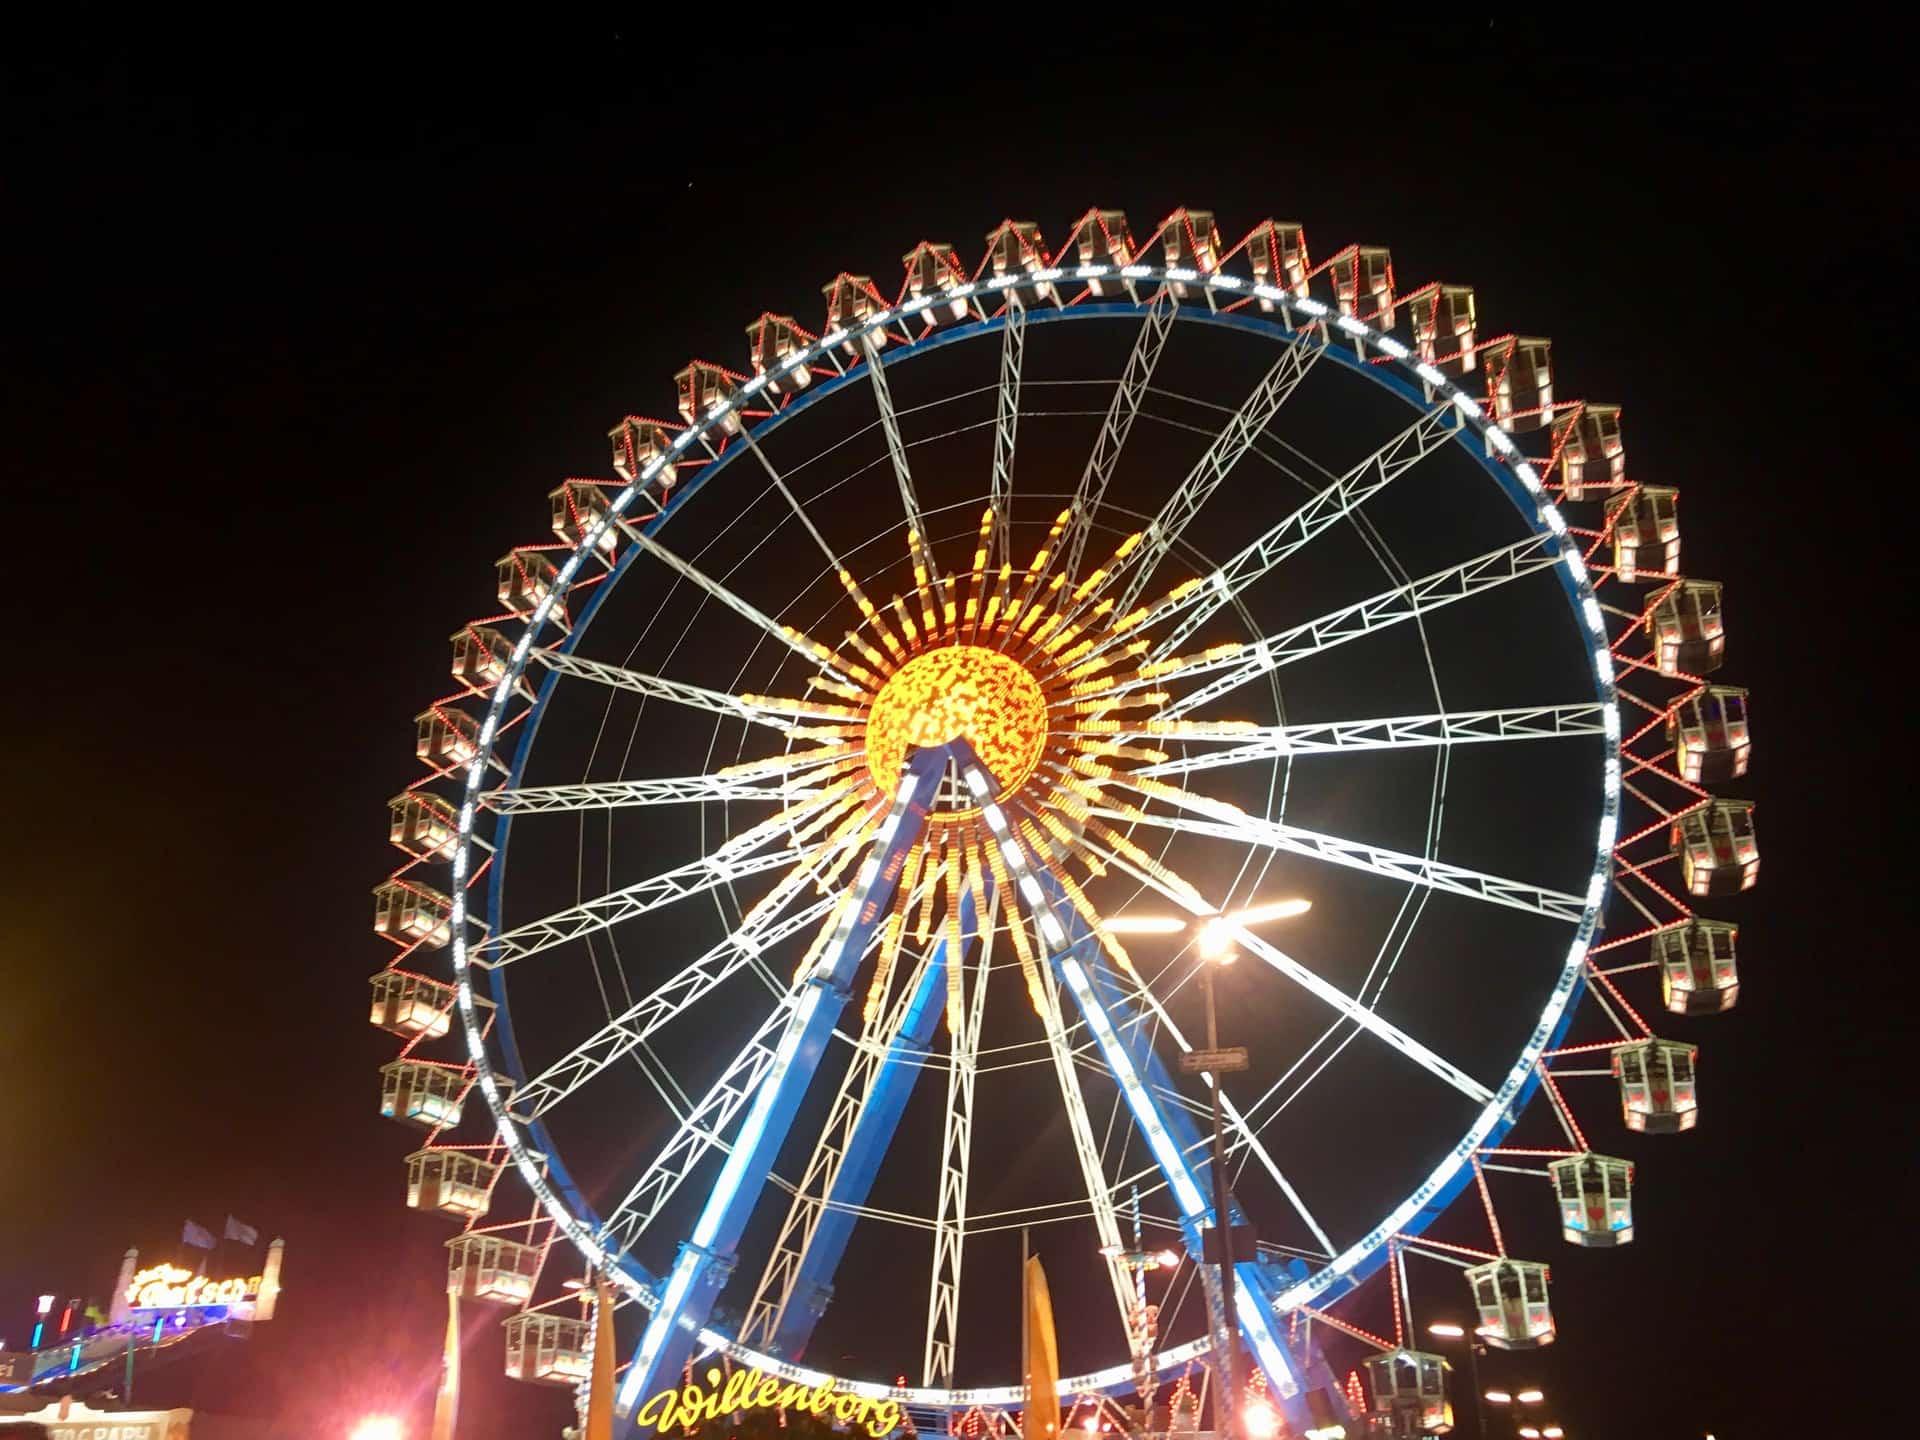 Oktoberfest_Wiesn_Riesenrad_bei_Nacht